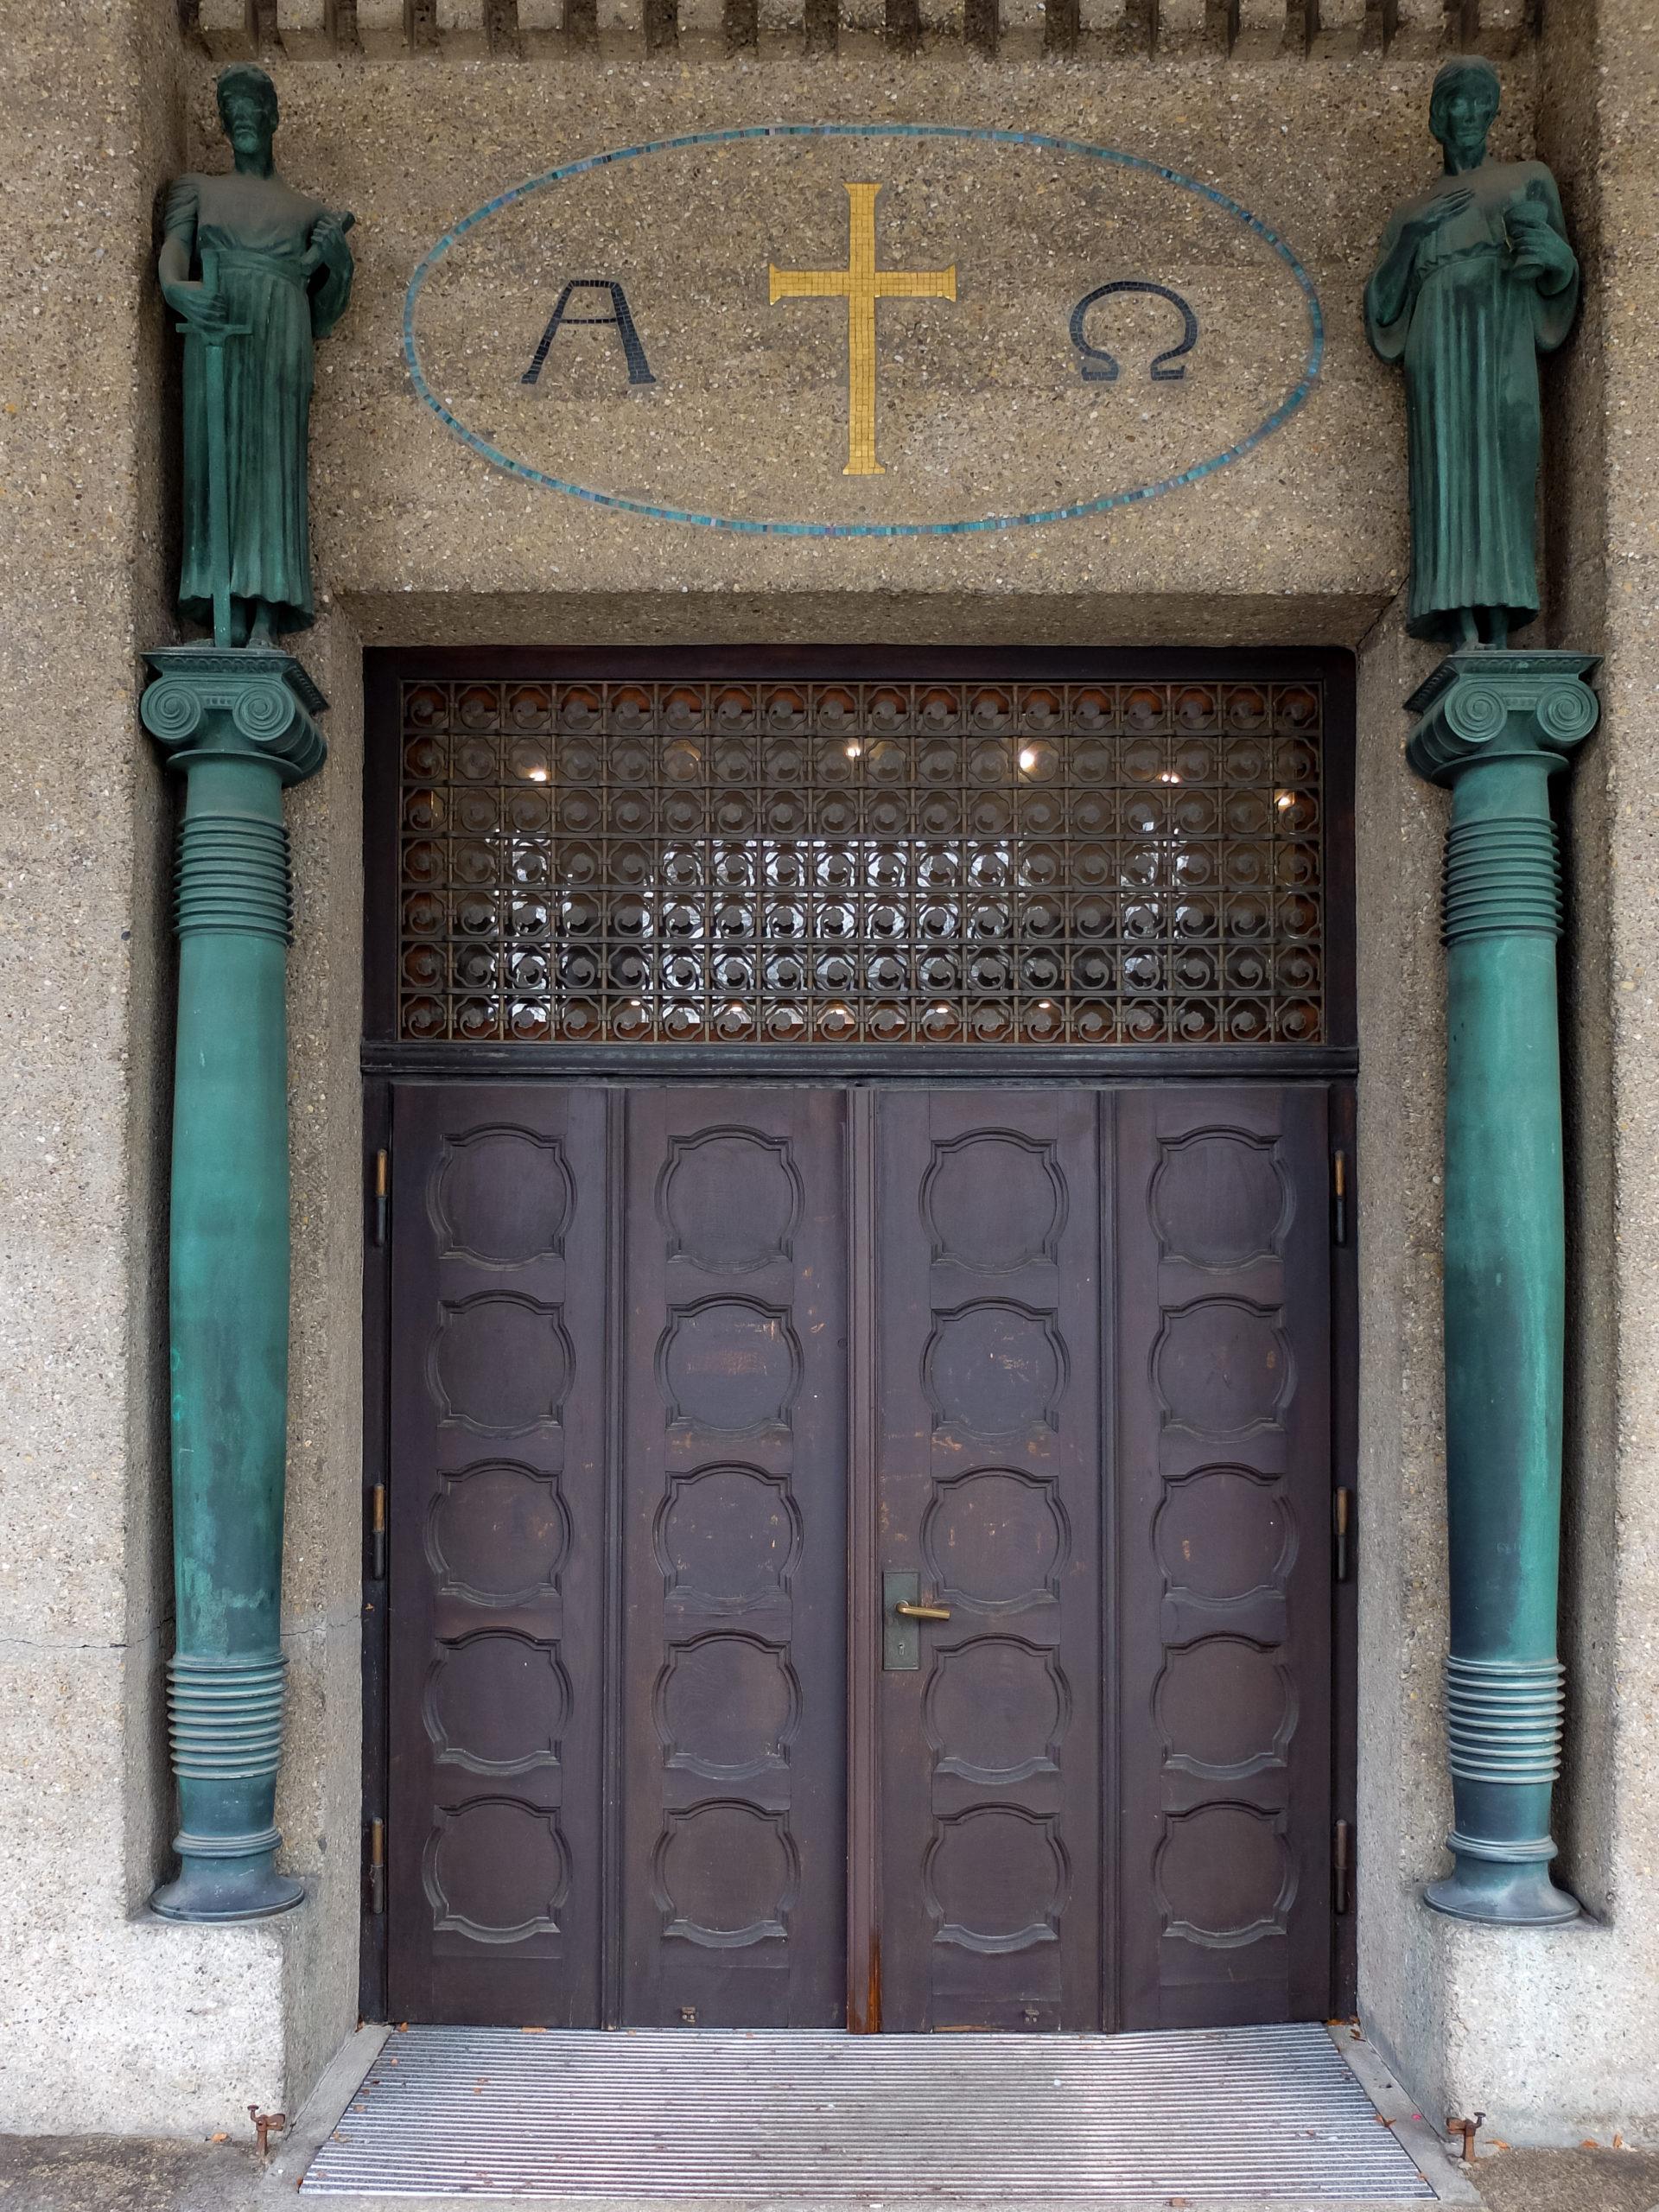 St. Paul's Church, 1908-1910. Architect: Theodor Fischer